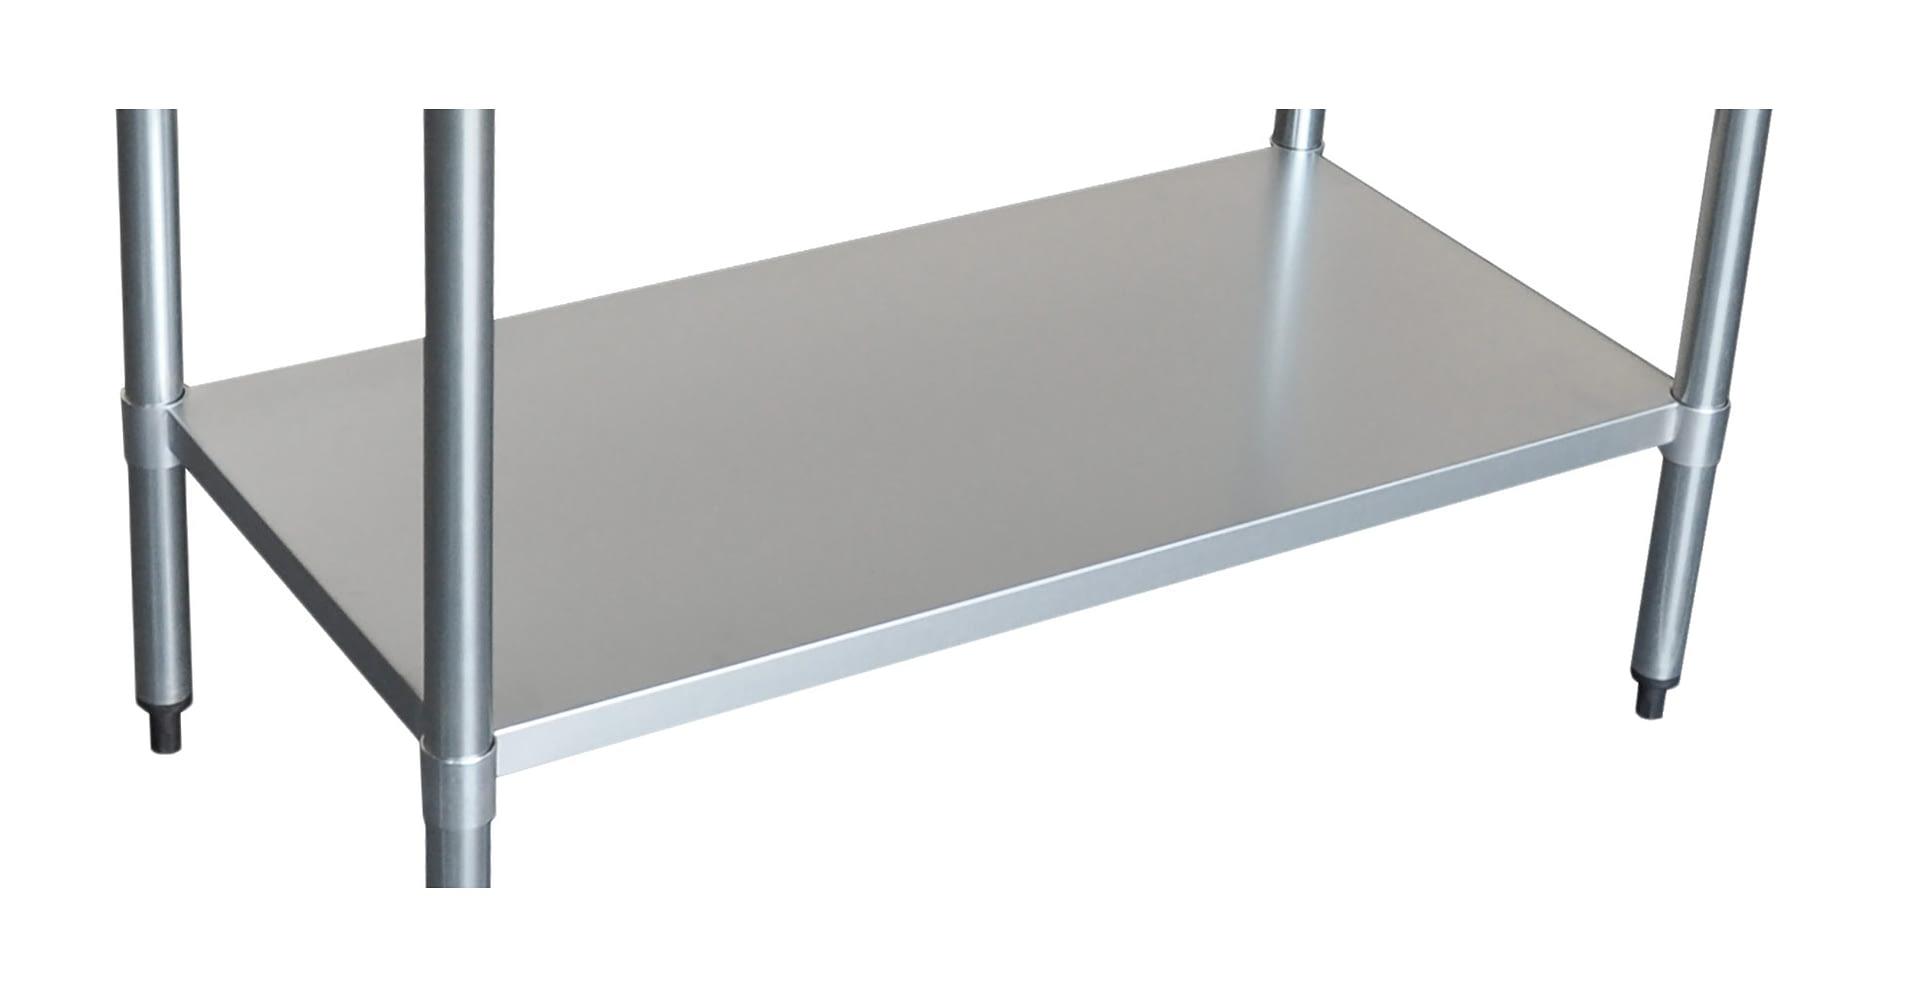 Stainless Undershelf for 3060 Bench